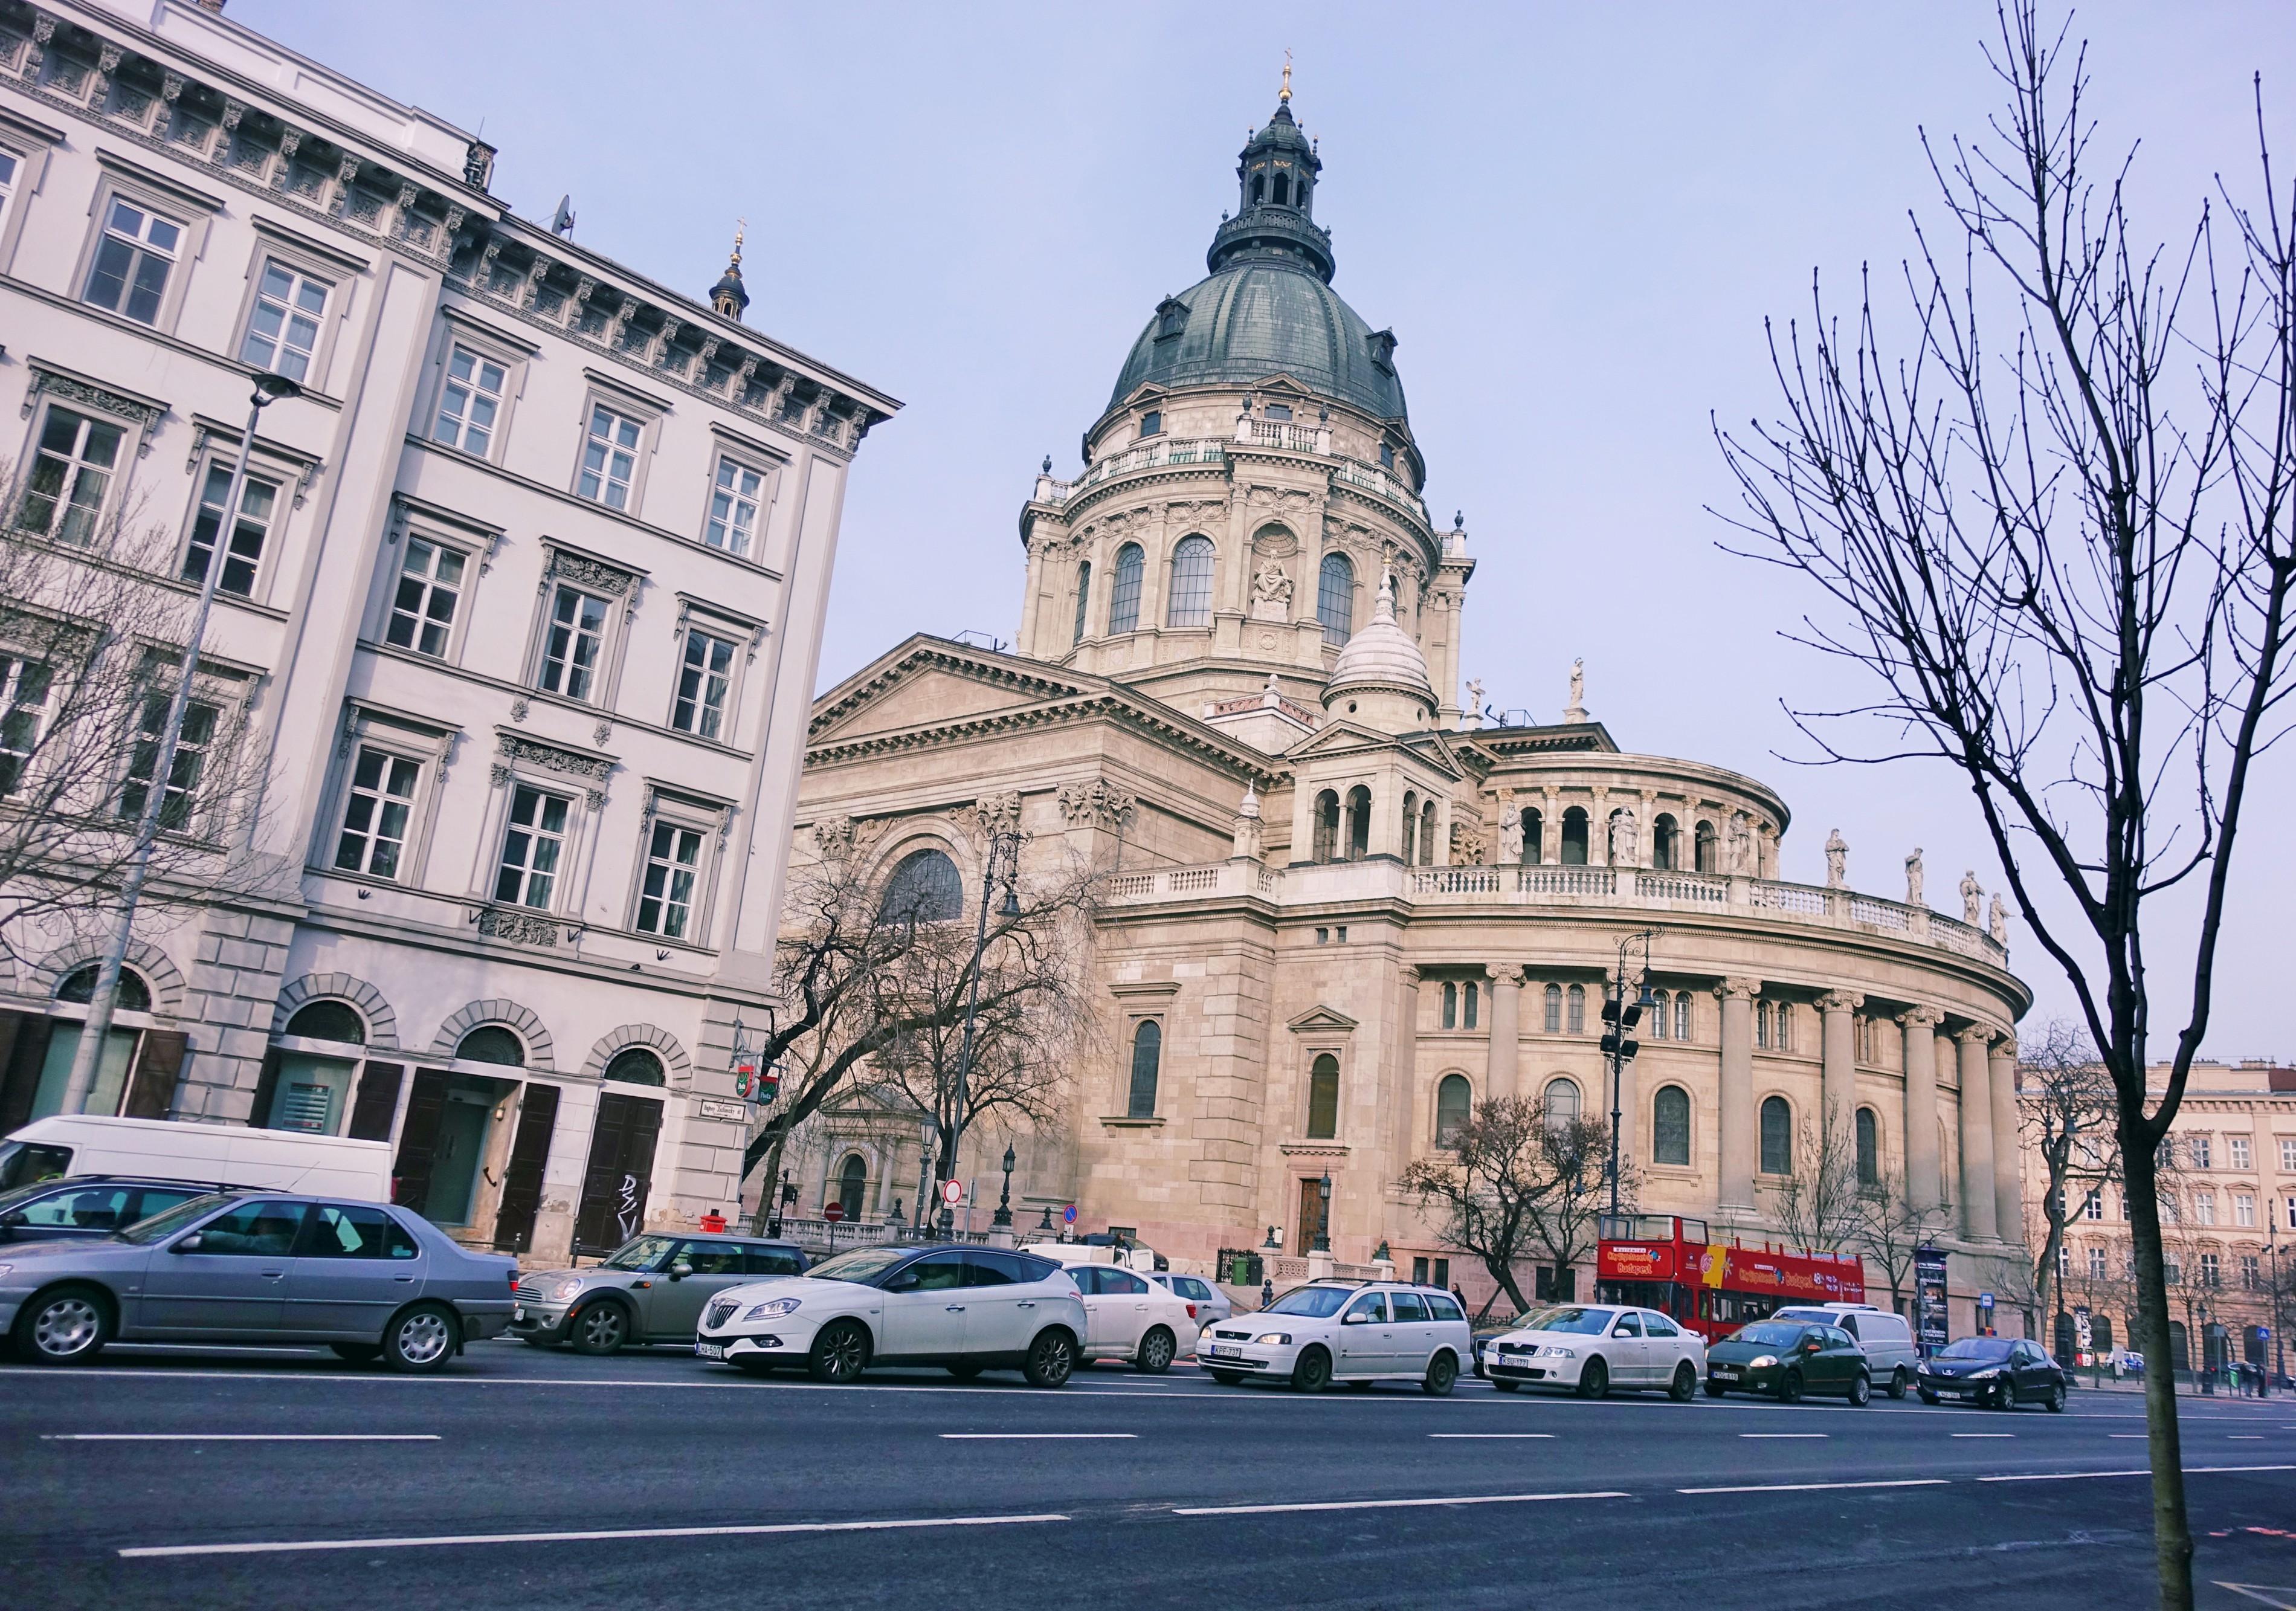 Blog-de-viajes-ChicAdicta-fashionista-influencer-Chic-Adicta-fashion-travel-Budapest-mejores-ciudades-de-europa-PiensaenChic-Piensa-en-Chic